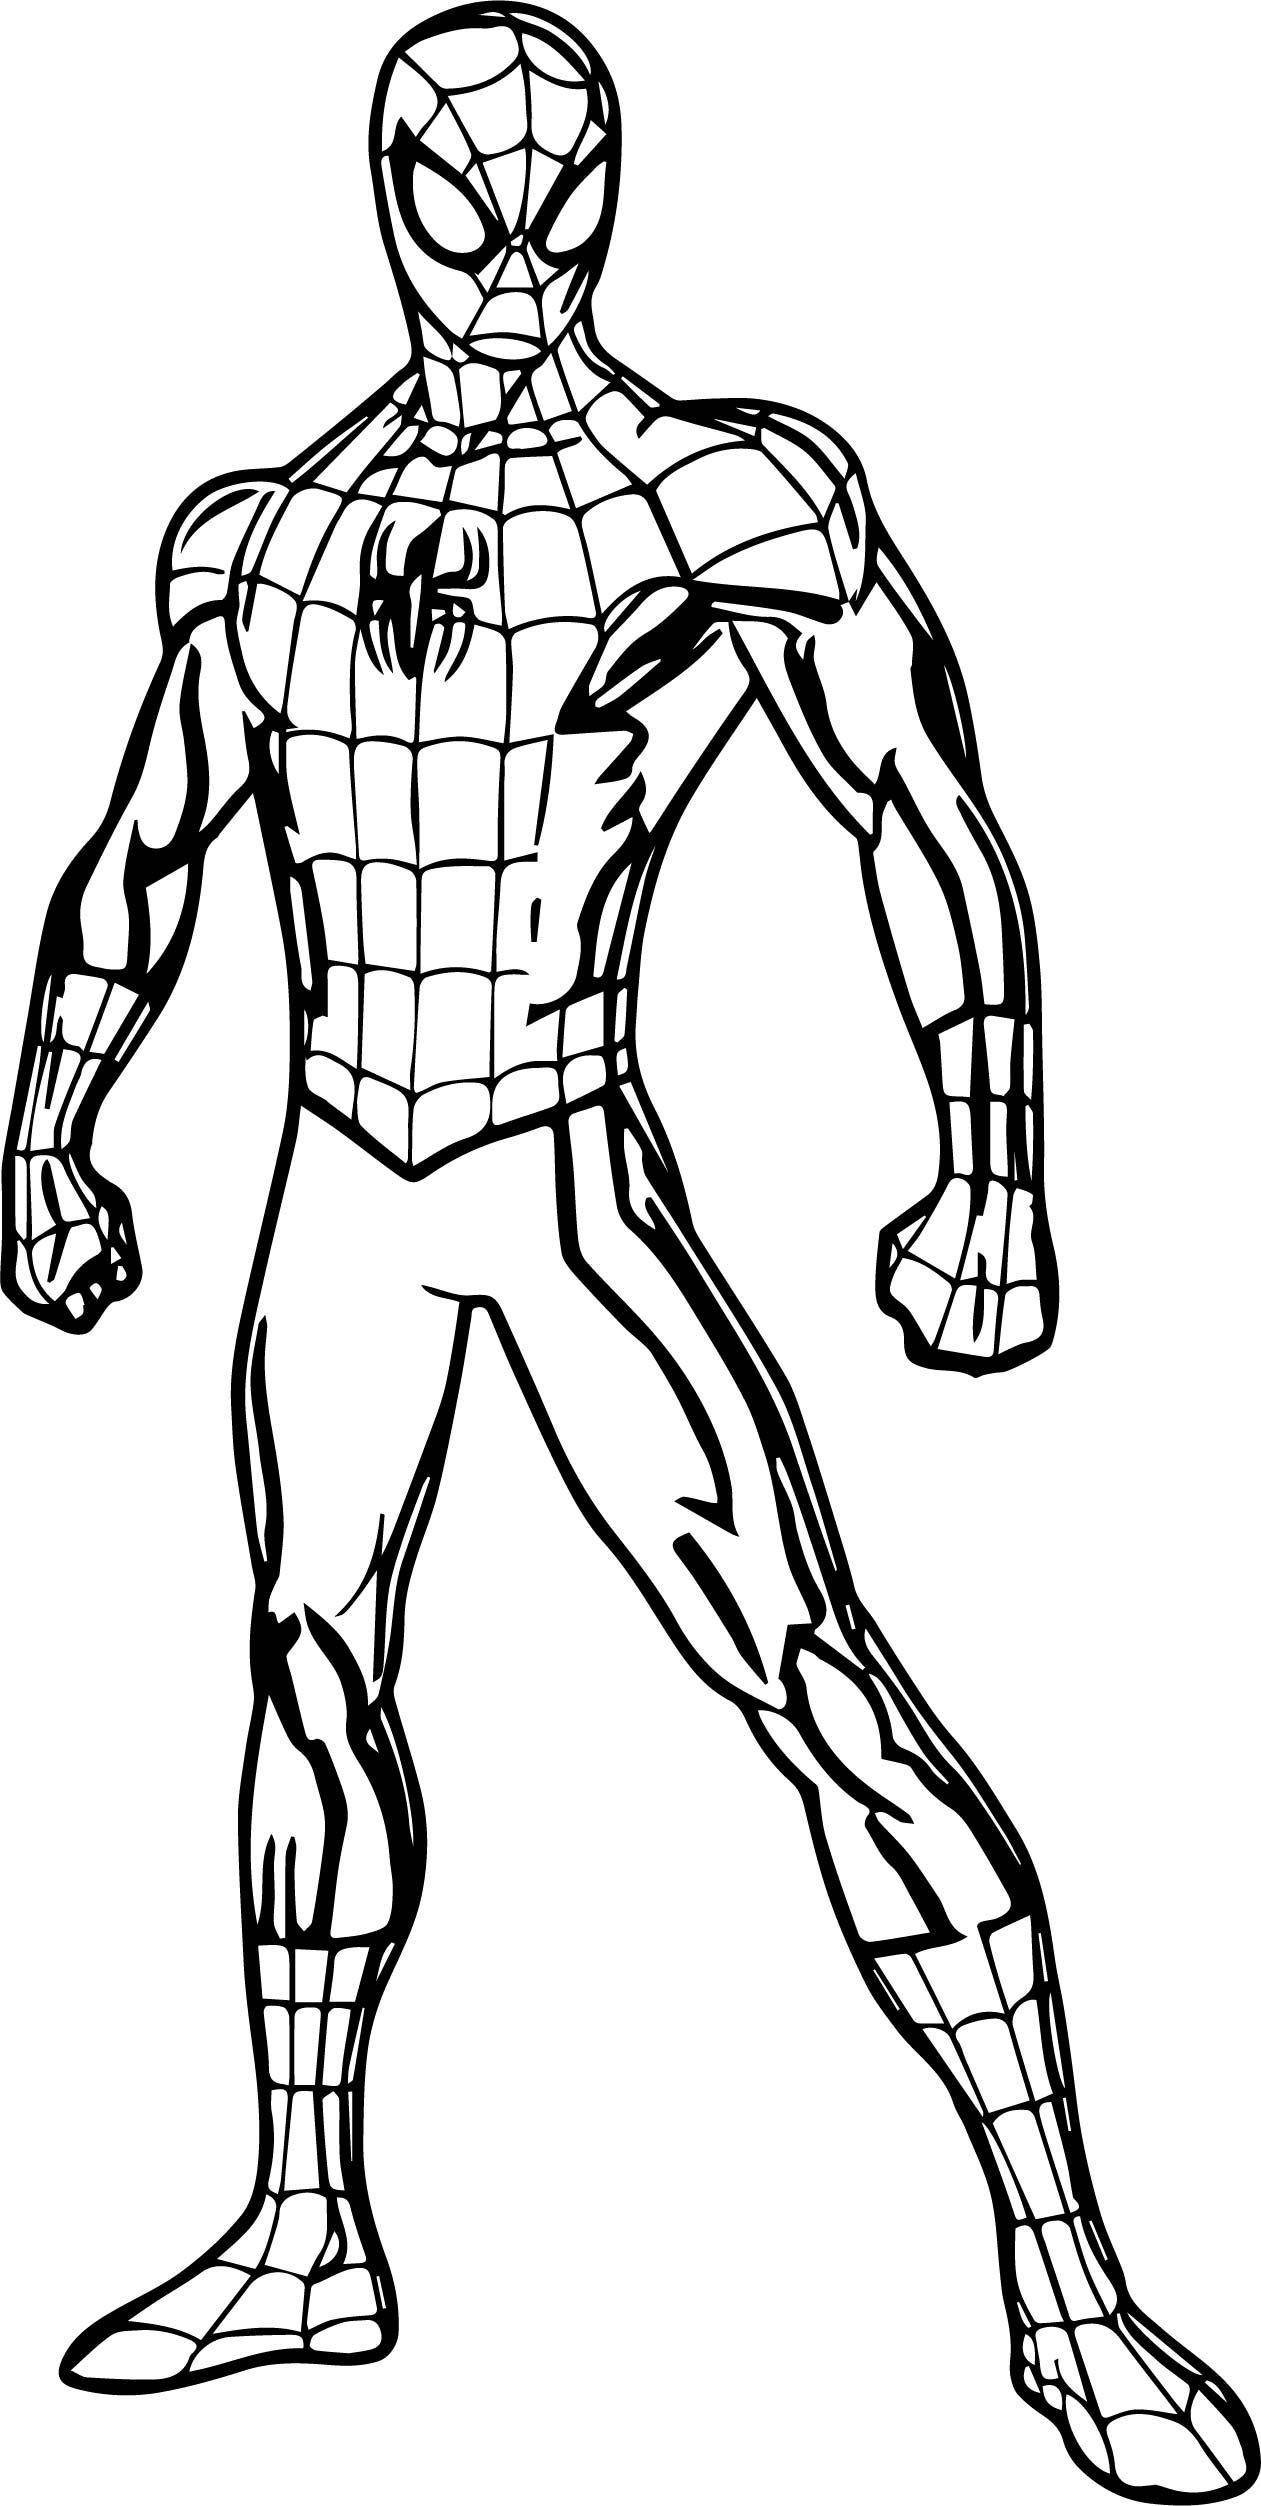 Cool Spider Man Pose Coloring Page Superhero Coloring Superhero